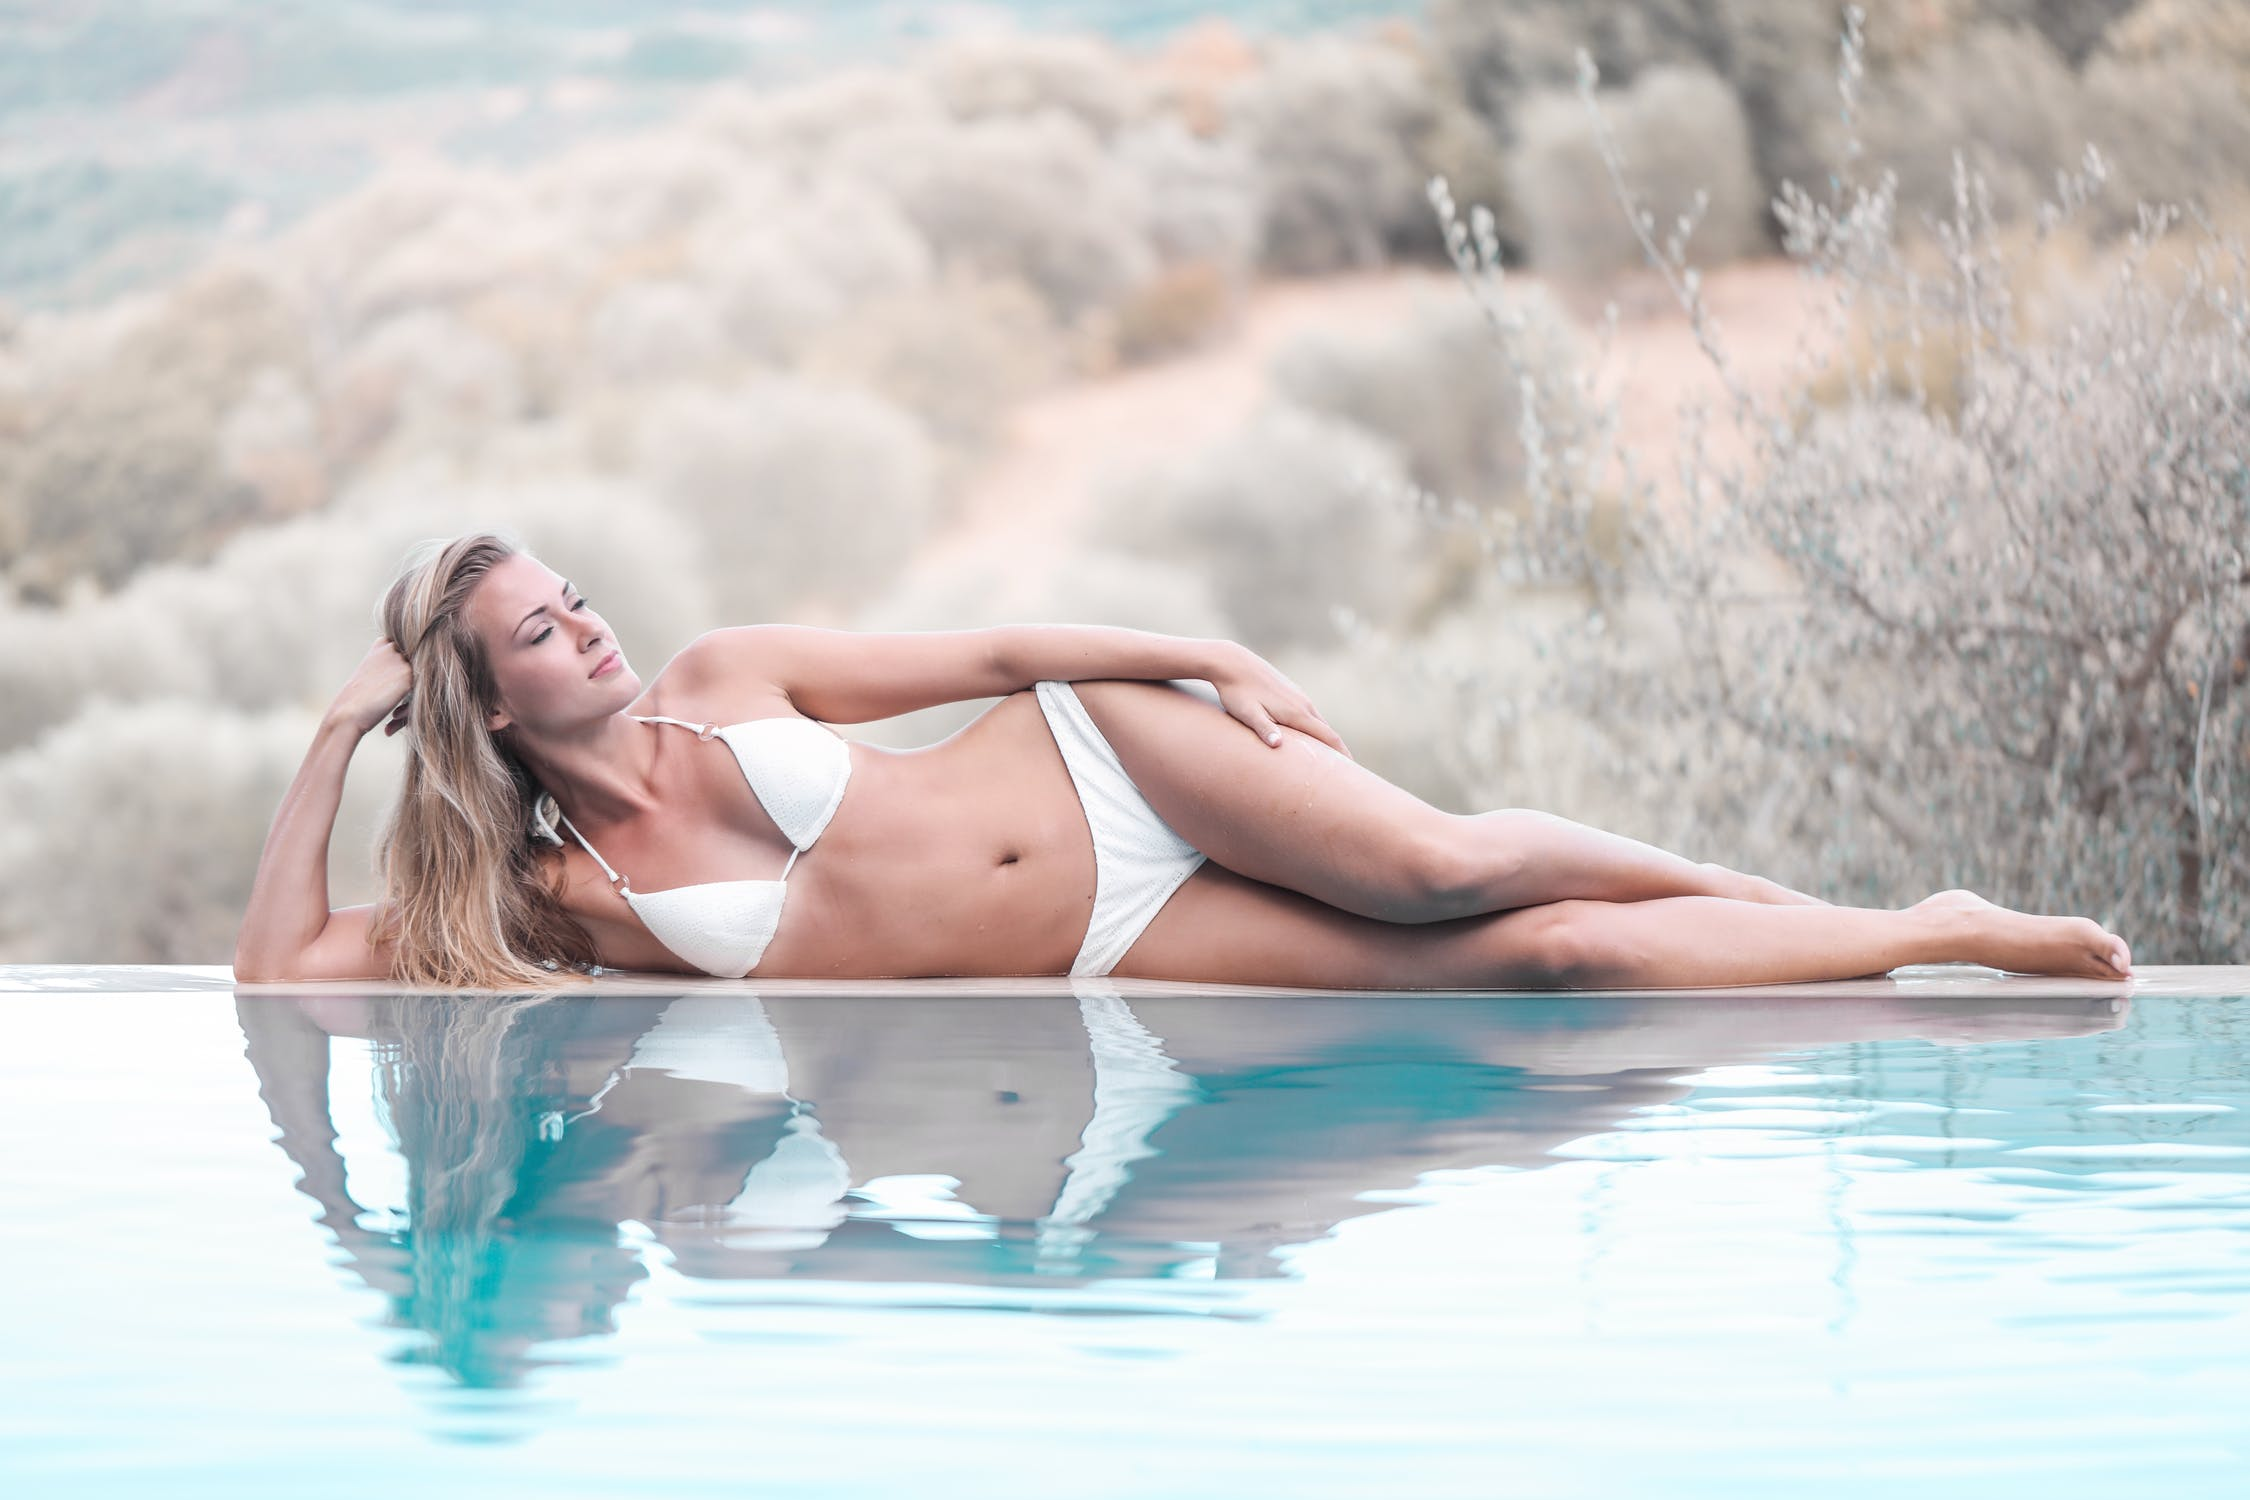 Bikini Sales, Popular Even During Pandemic